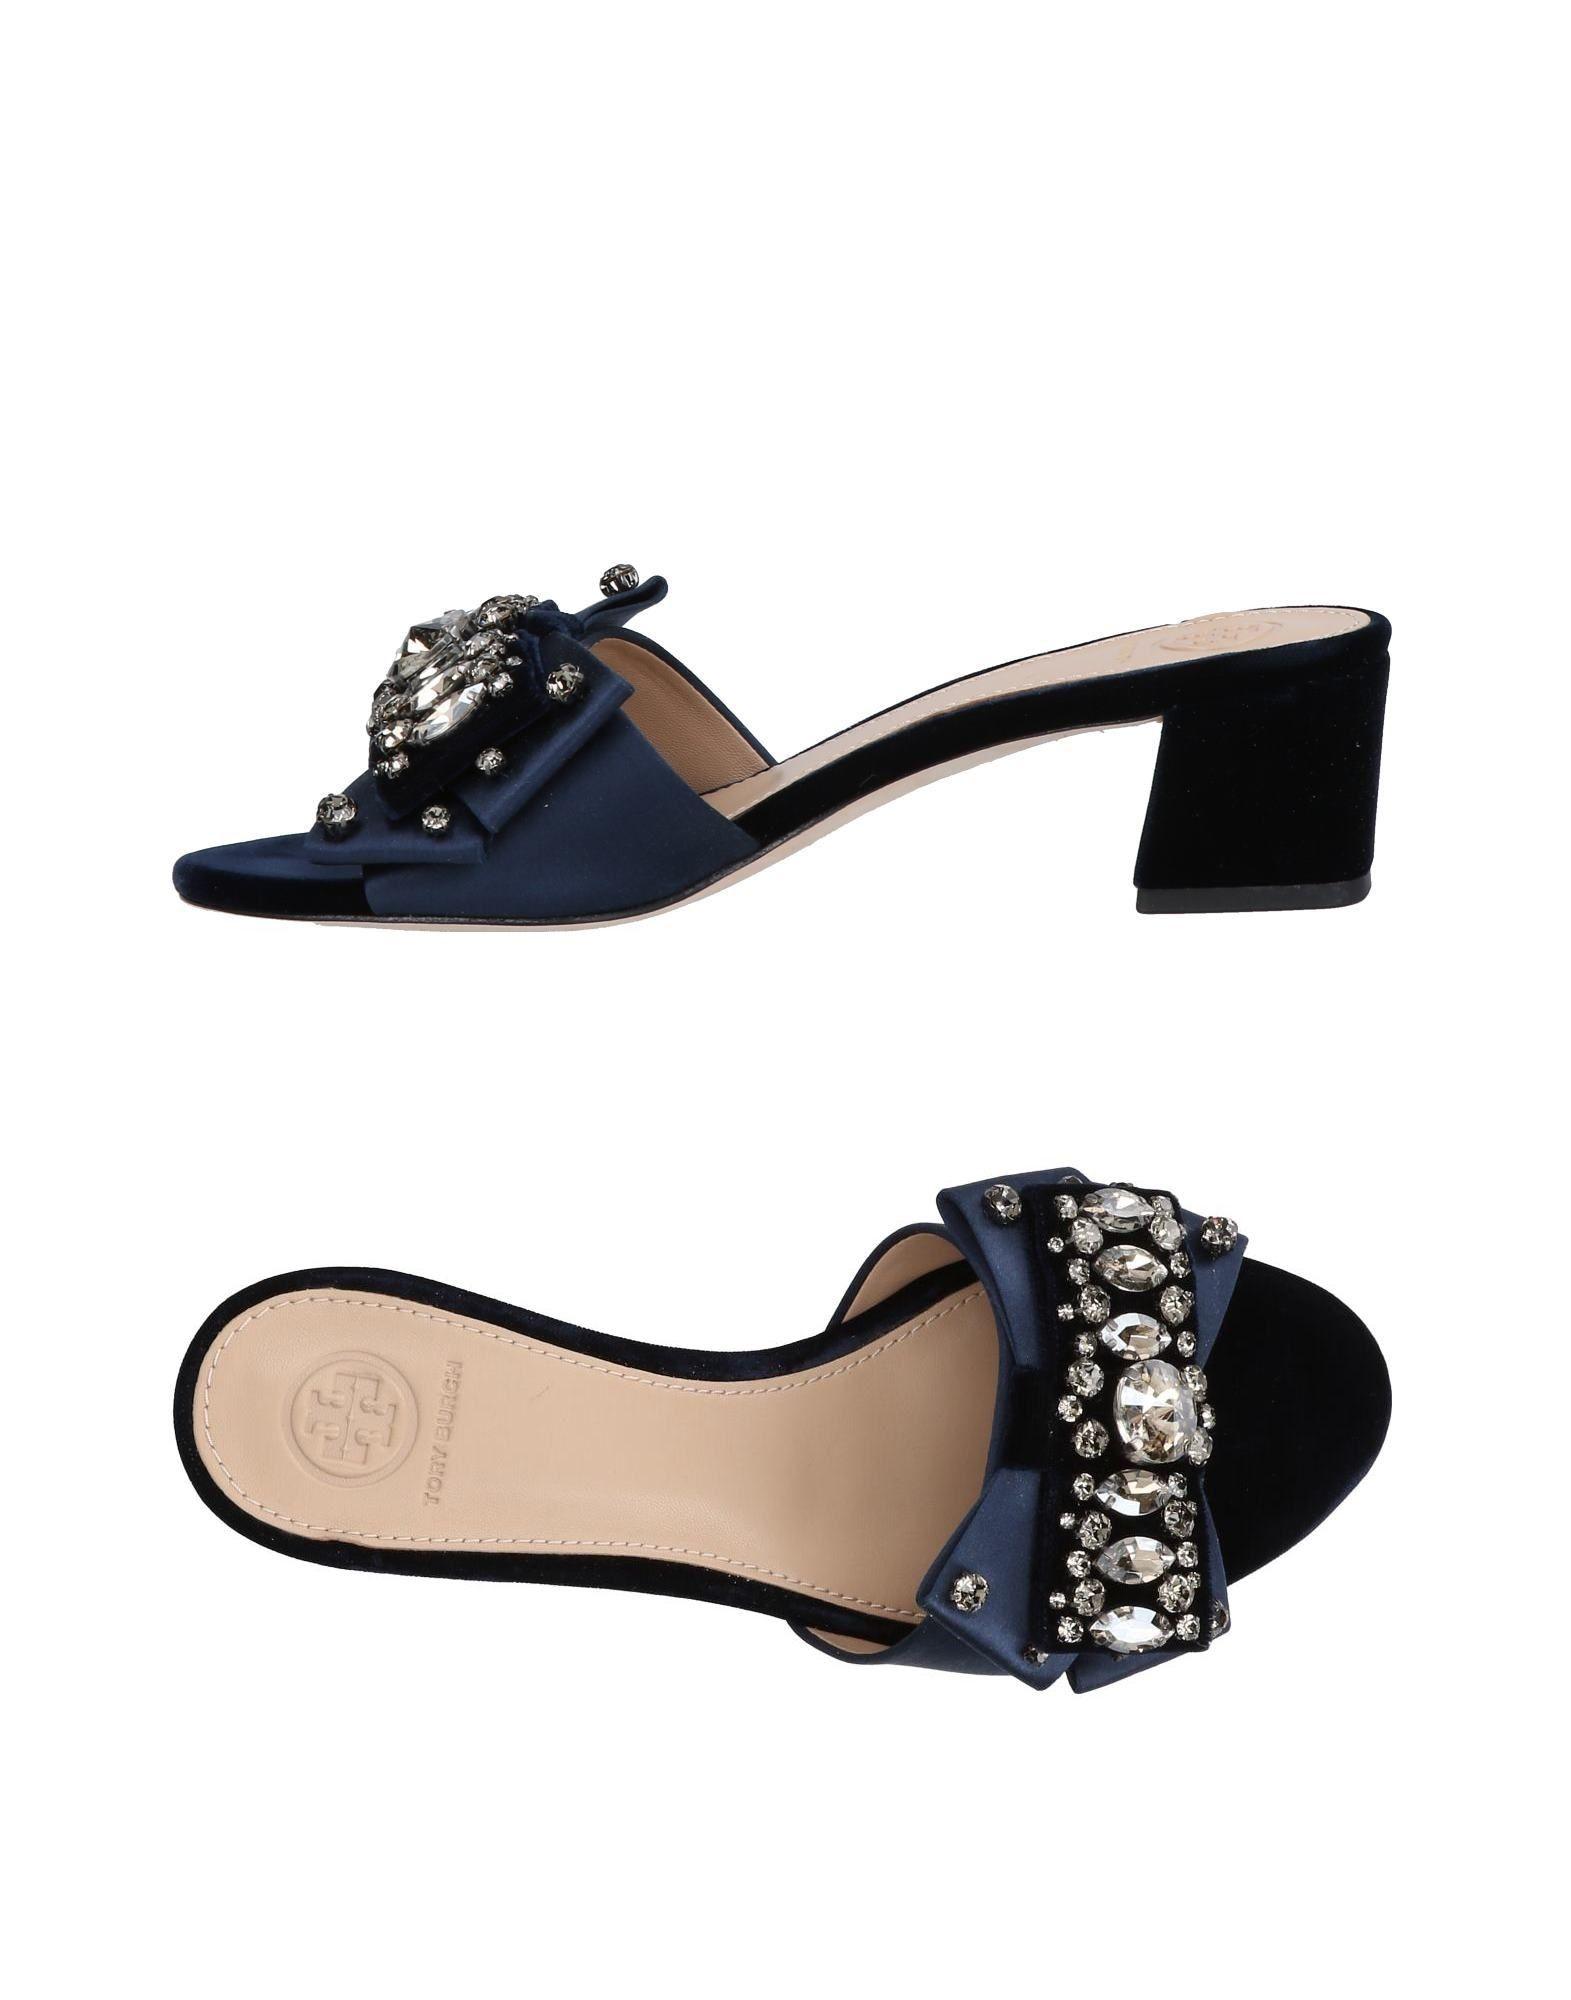 Tory Burch Burch Sandals - Women Tory Burch Burch Sandals online on  United Kingdom - 11451979GS 6e4d74